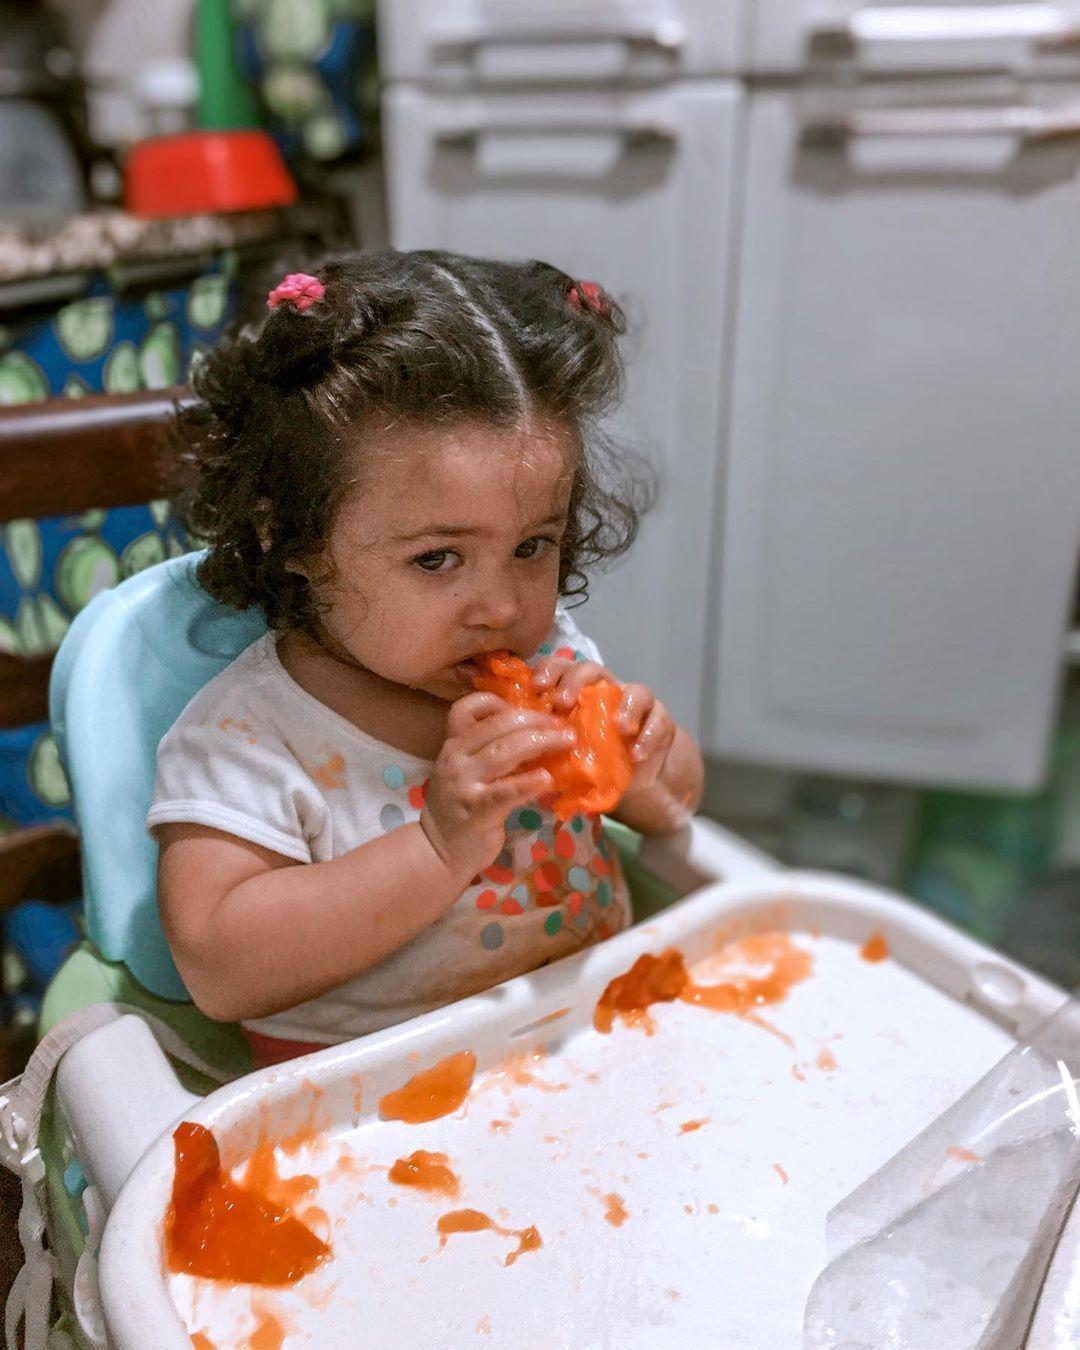 Quem aí ama caqui ? Adoroooo ✨ . . . . .  #bebe #baby #maedemenina #maternidade  #love #amor #gestante  #babygirl #fotografia #instababy #familia #maedeprimeiraviagem #kids #brasil #menino #photography #mamae #gravidez #maternidadereal #modainfantil #mundorosa #cute #newborn #fashion #moda #presets #presetdalari #bohopresets #bohops #Lightroom